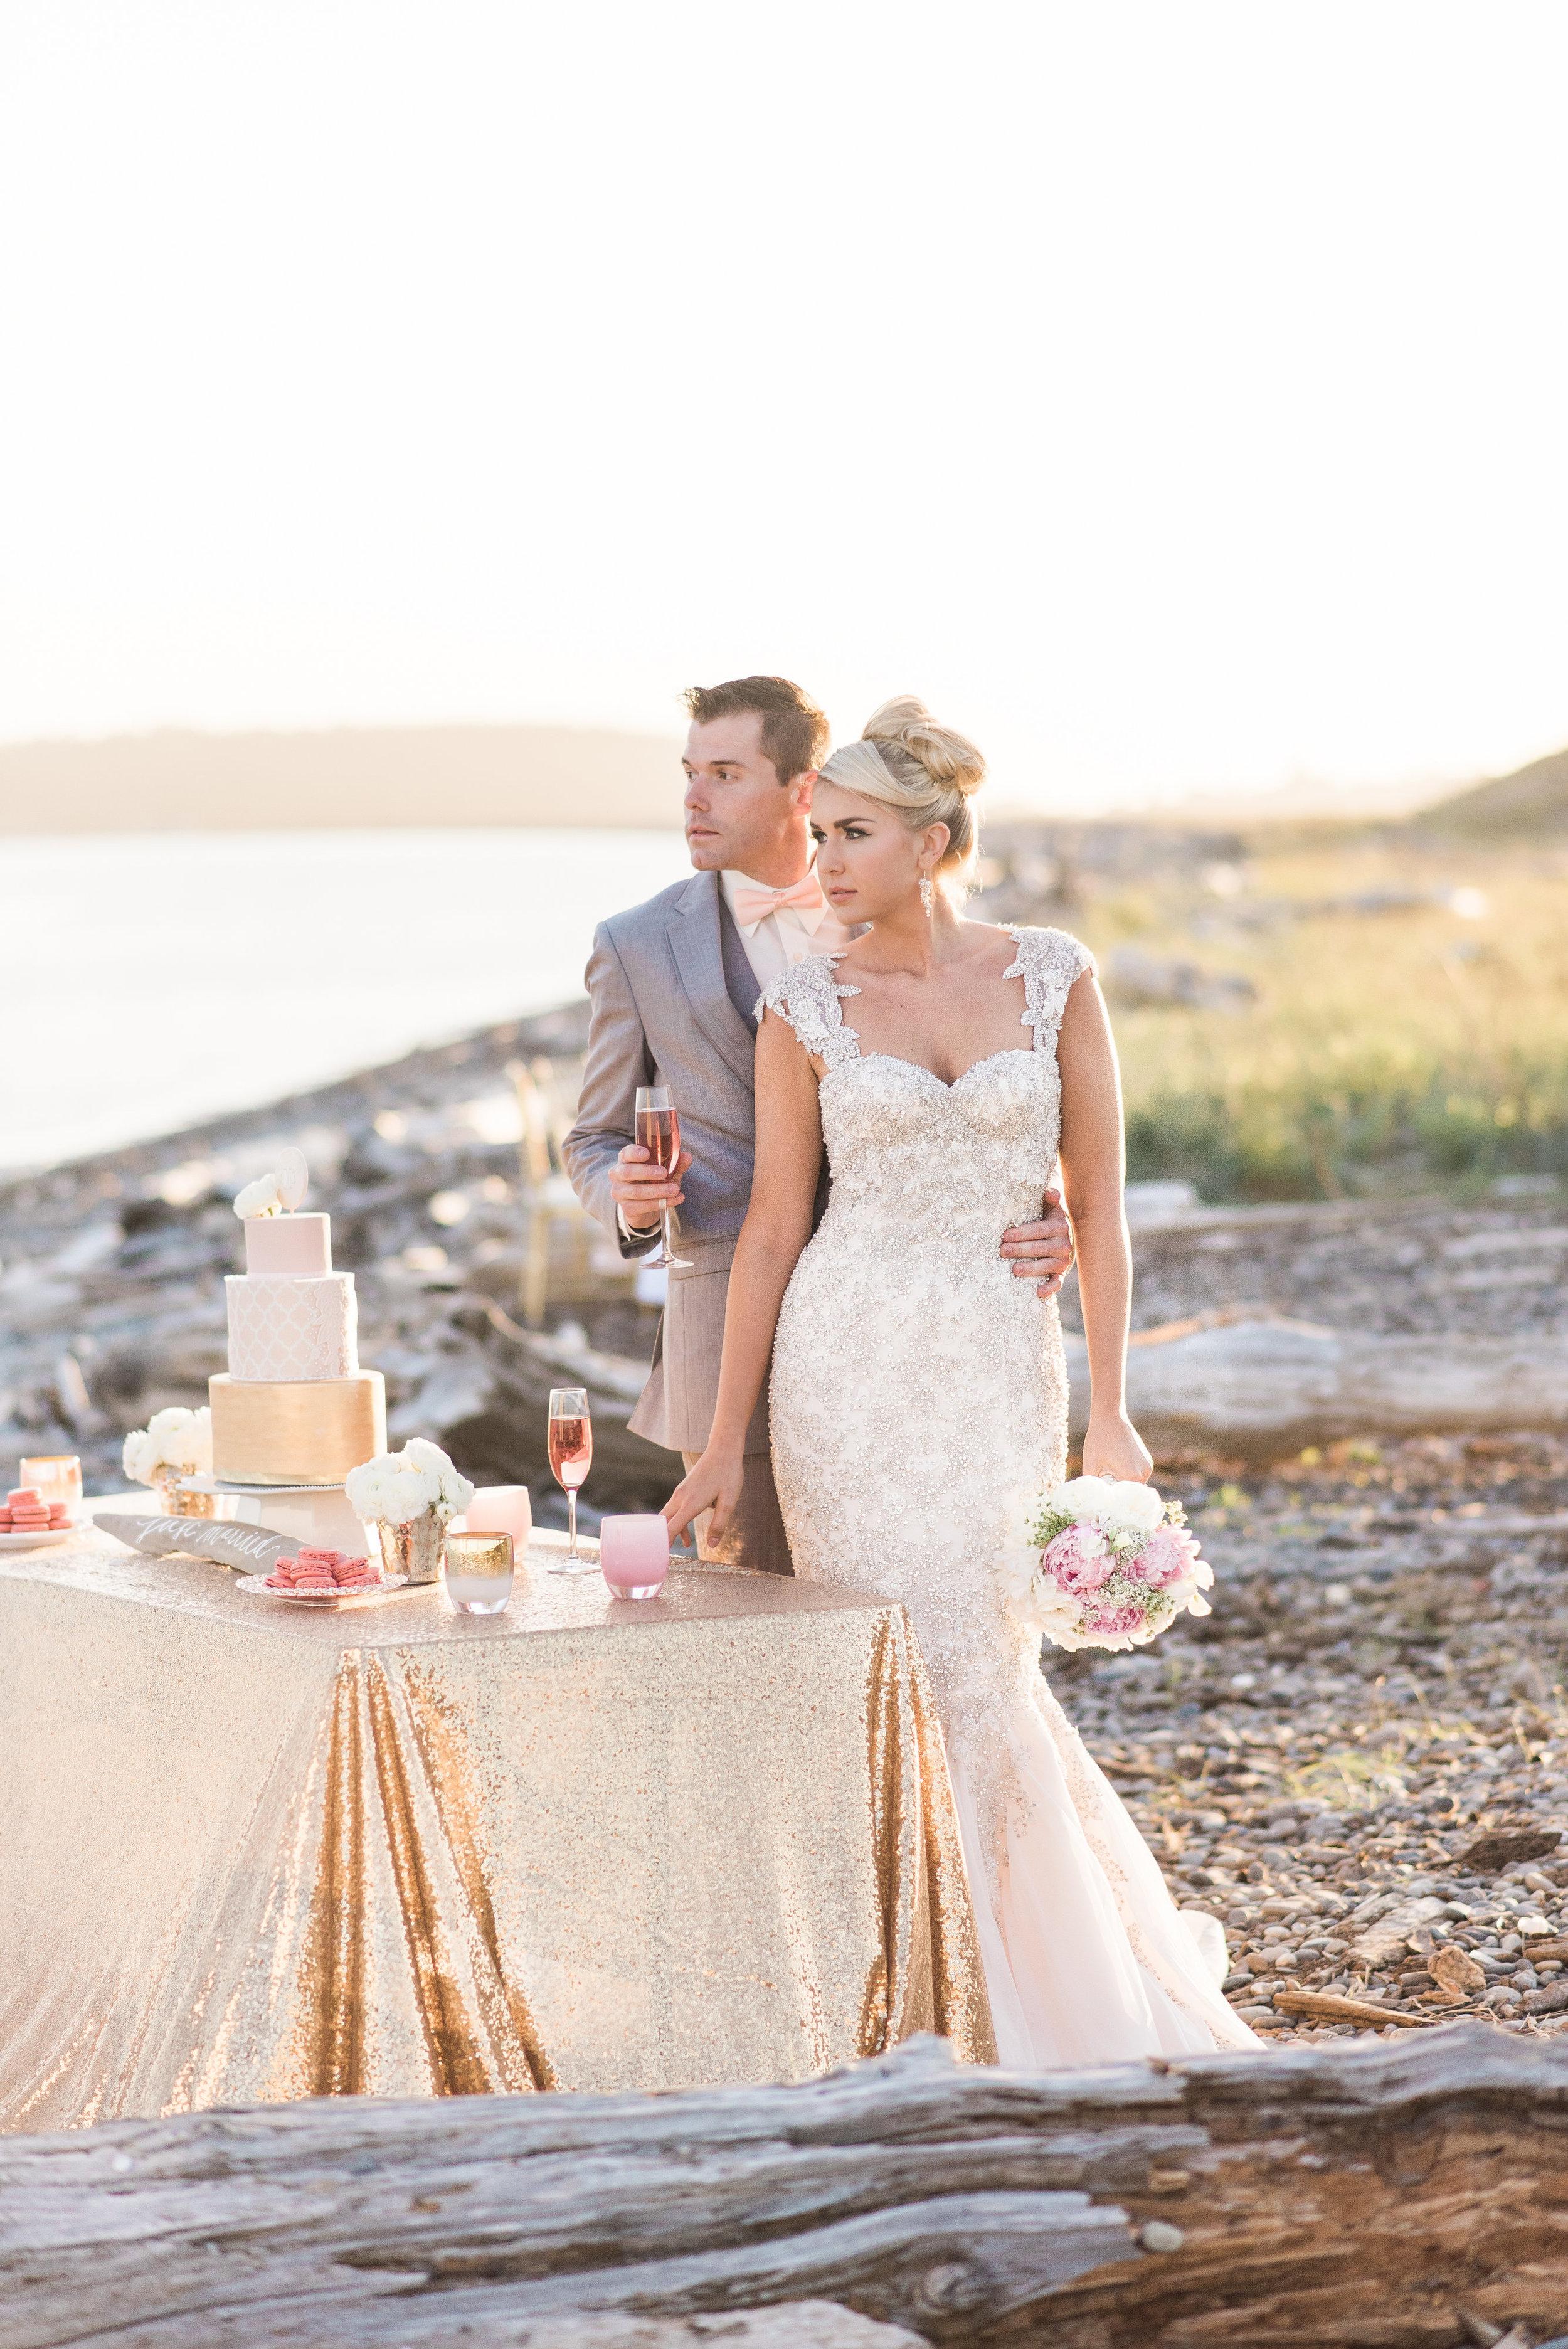 LCM Weddings & Events